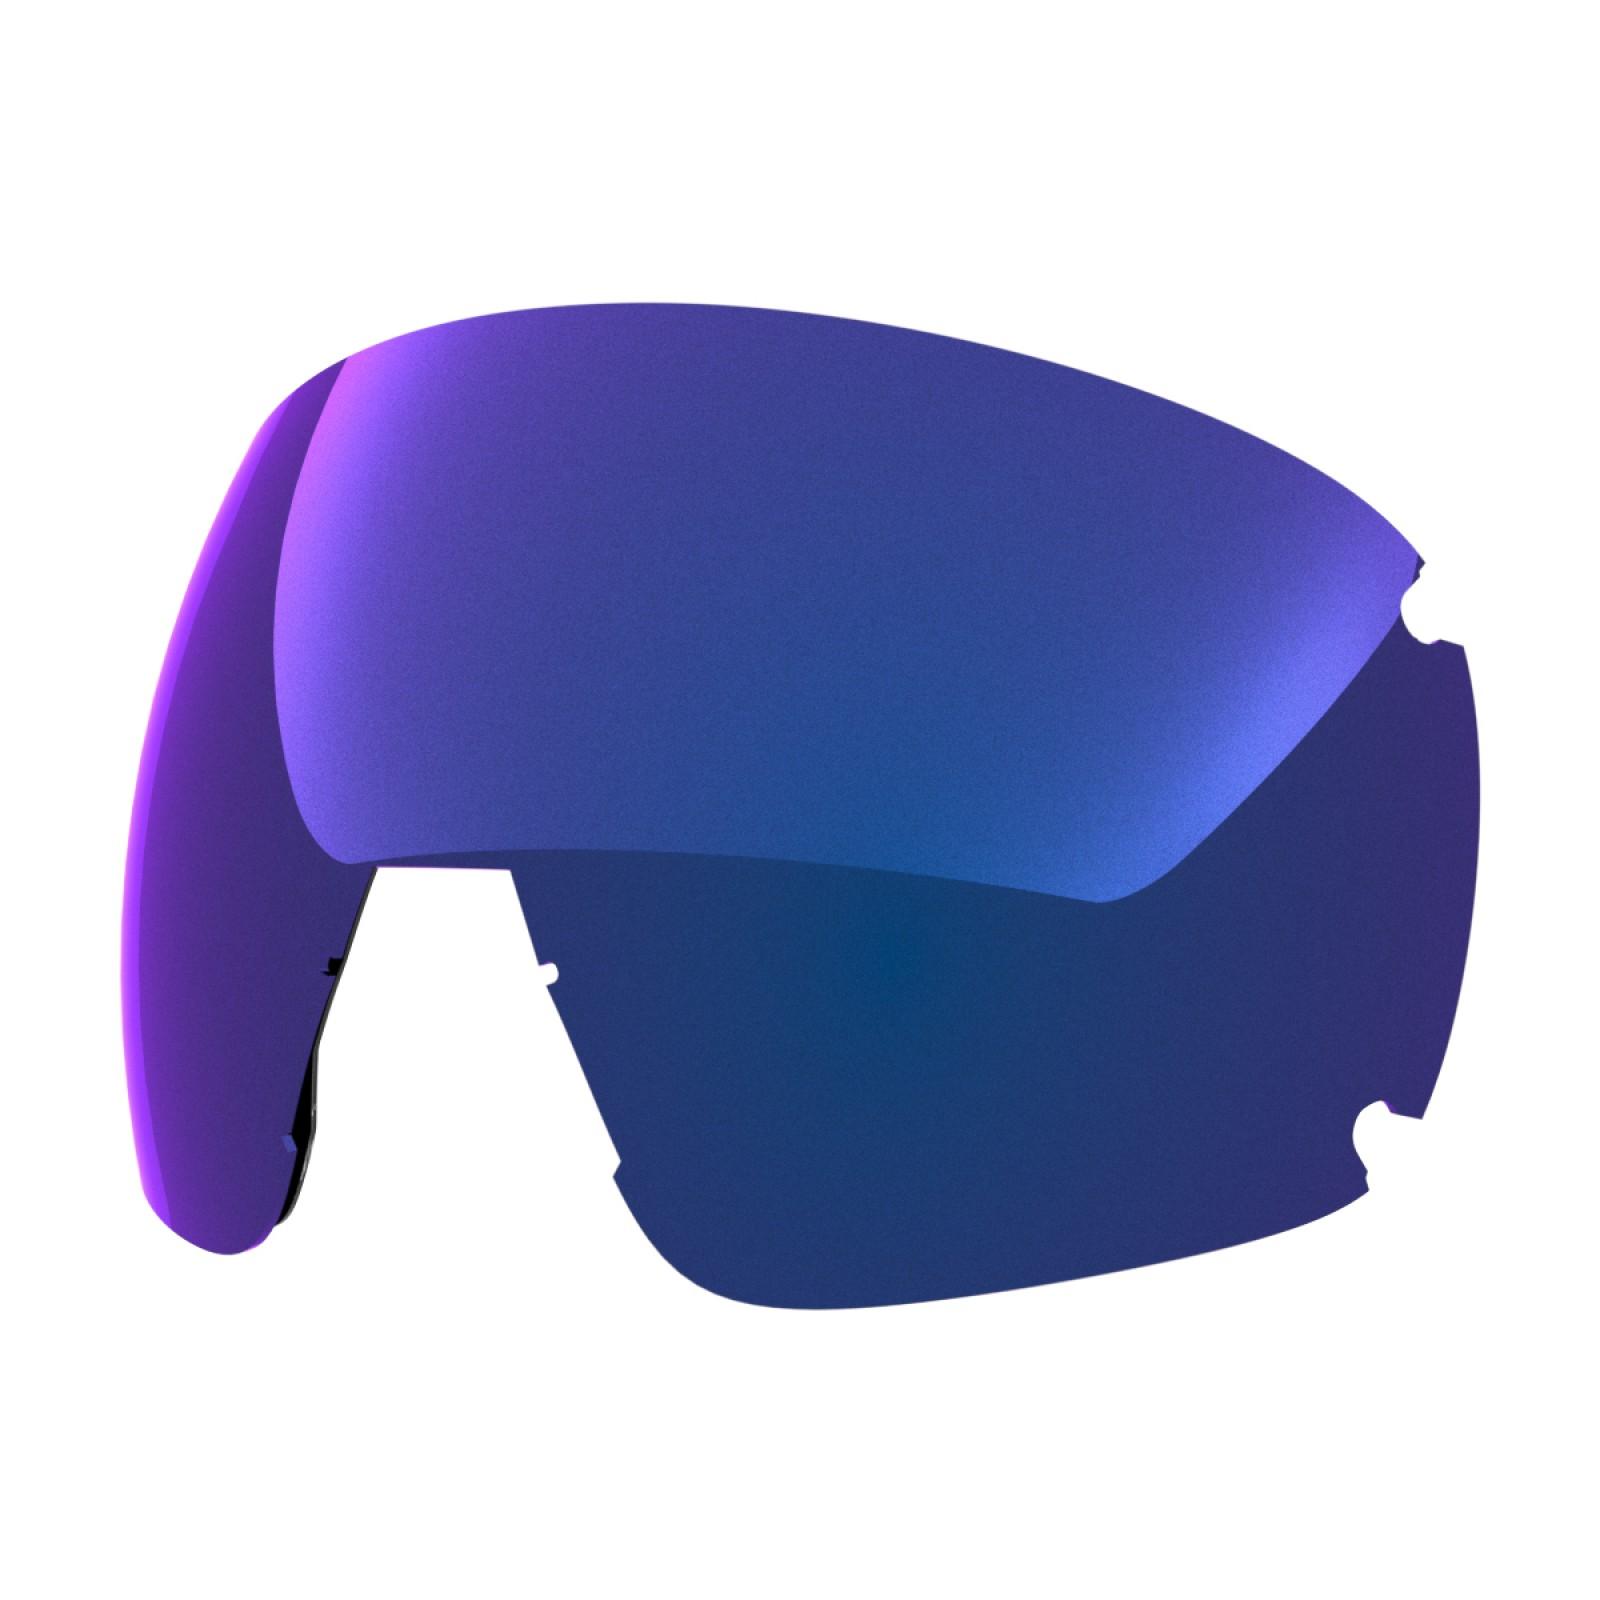 Blue mci lens for  Earth goggle